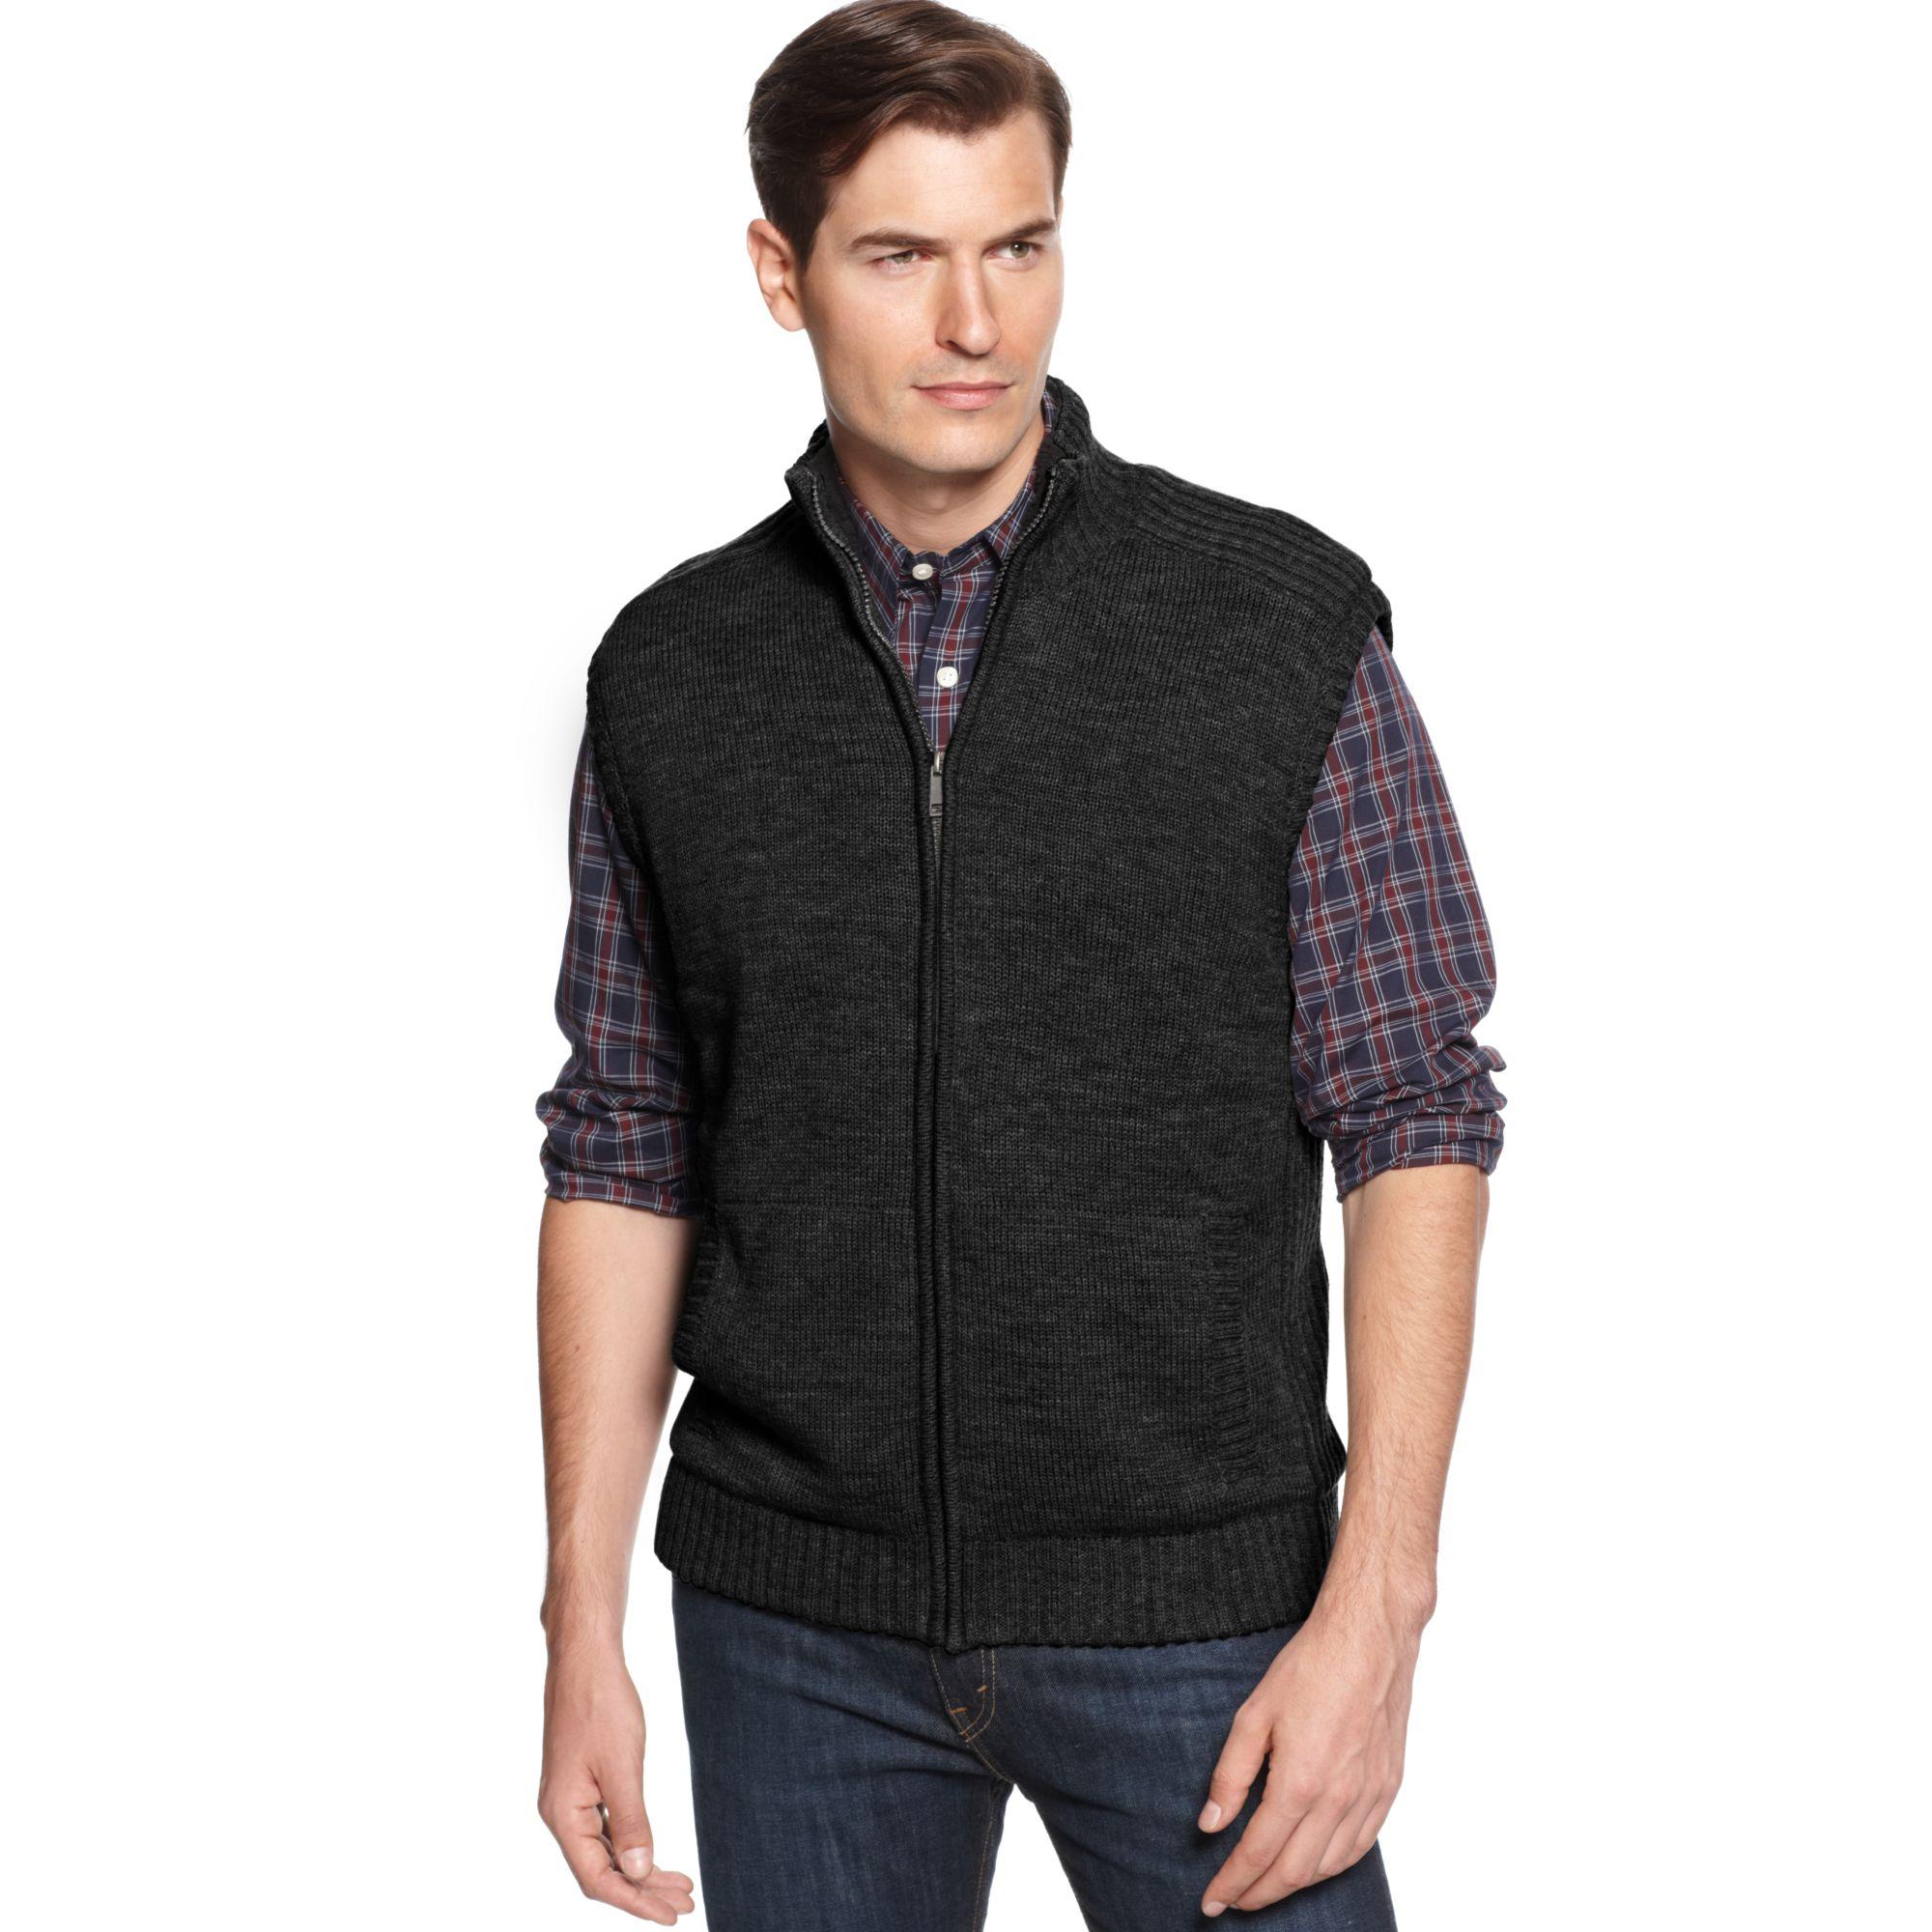 Oscar de la renta Zip-Front Mock Neck Microsherpa-Lined Sweater ...